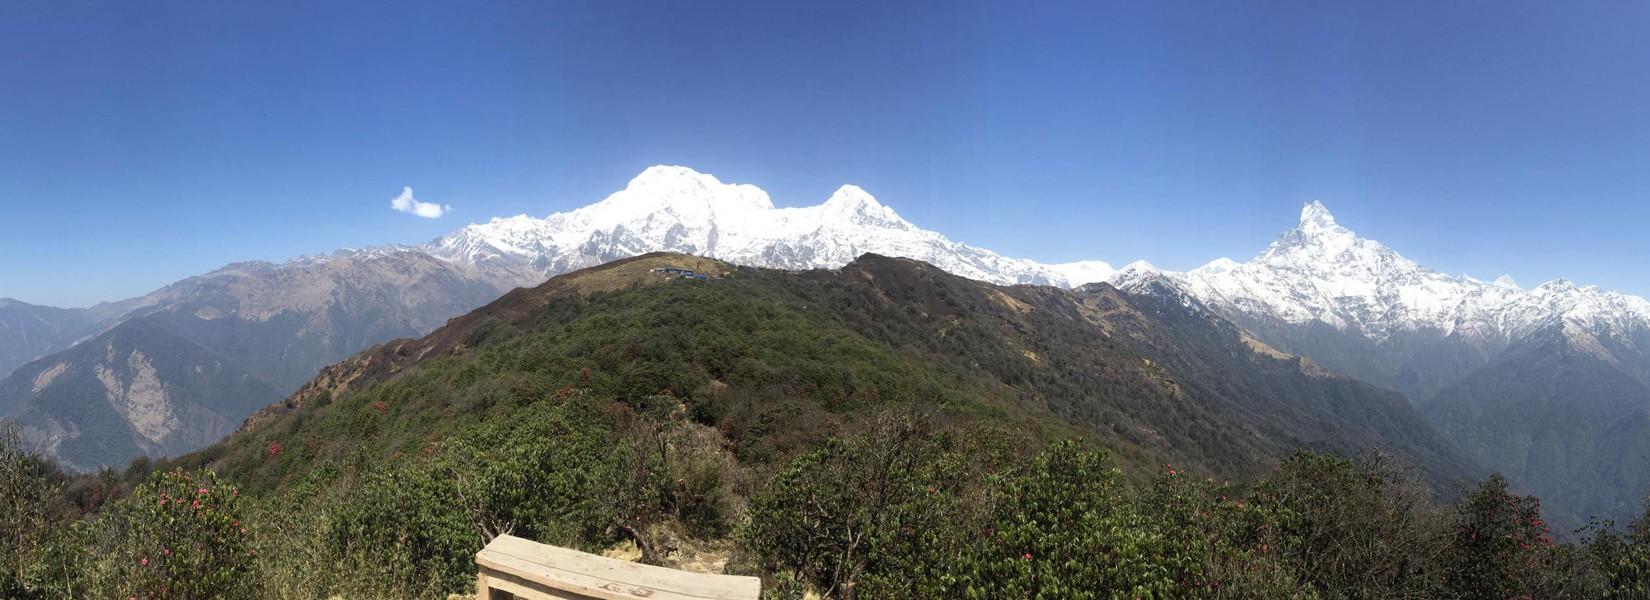 Annapurna Mardi Himal Trekking